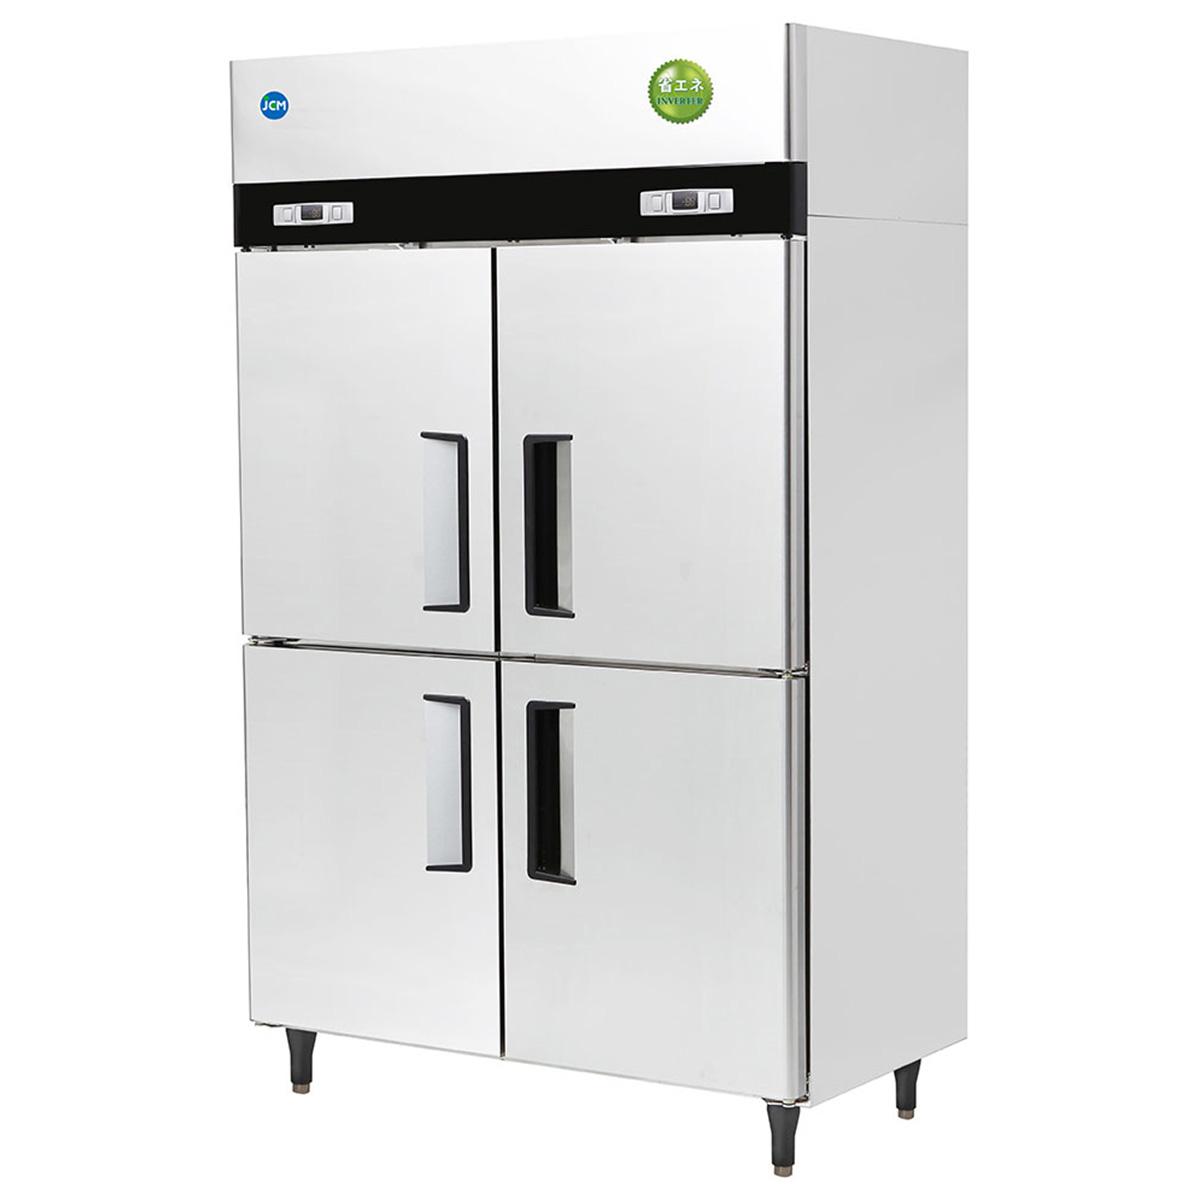 JCM タテ型 冷蔵庫 JCMR-1280-I 業務用 冷蔵 4ドア 省エネ 【代引不可】